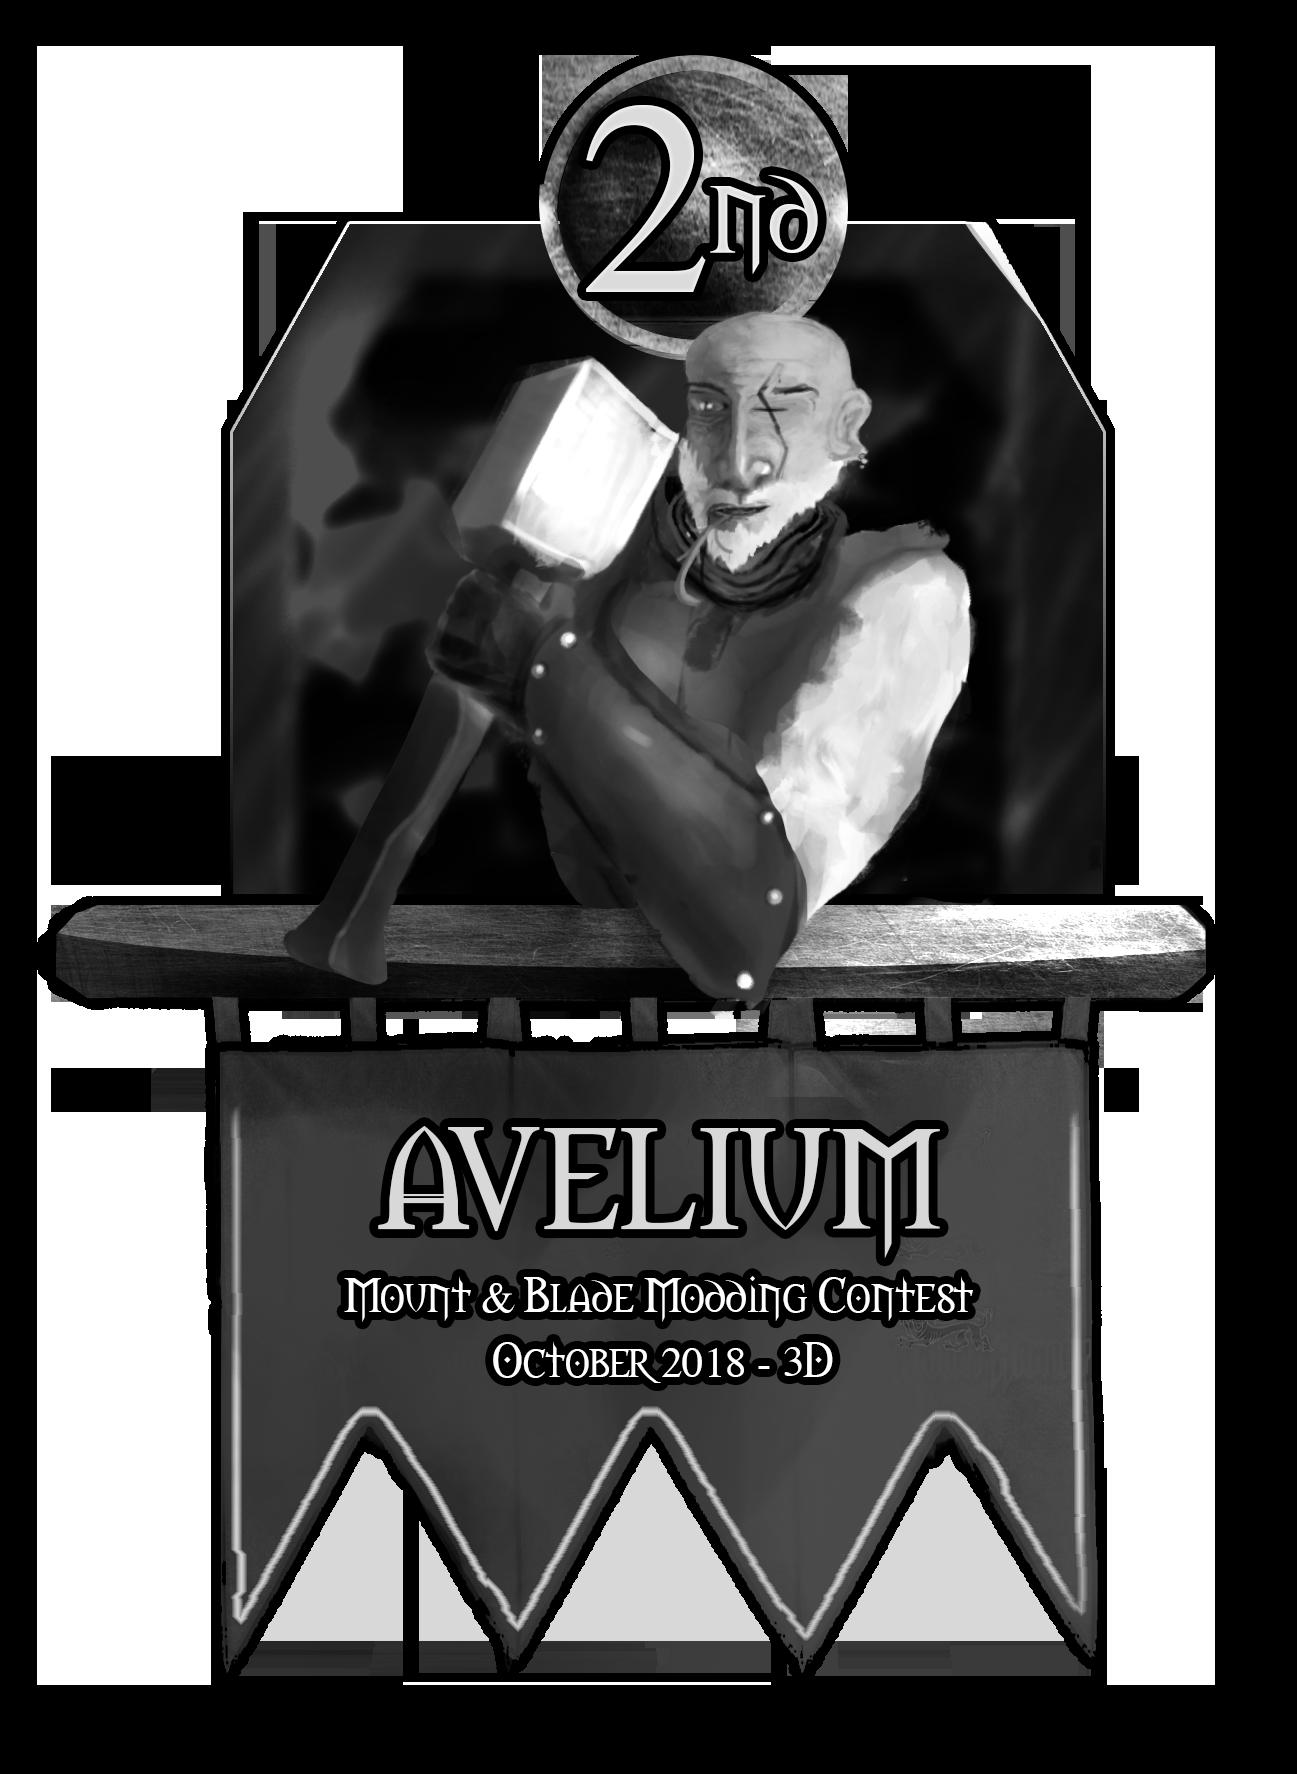 Avelium2.png